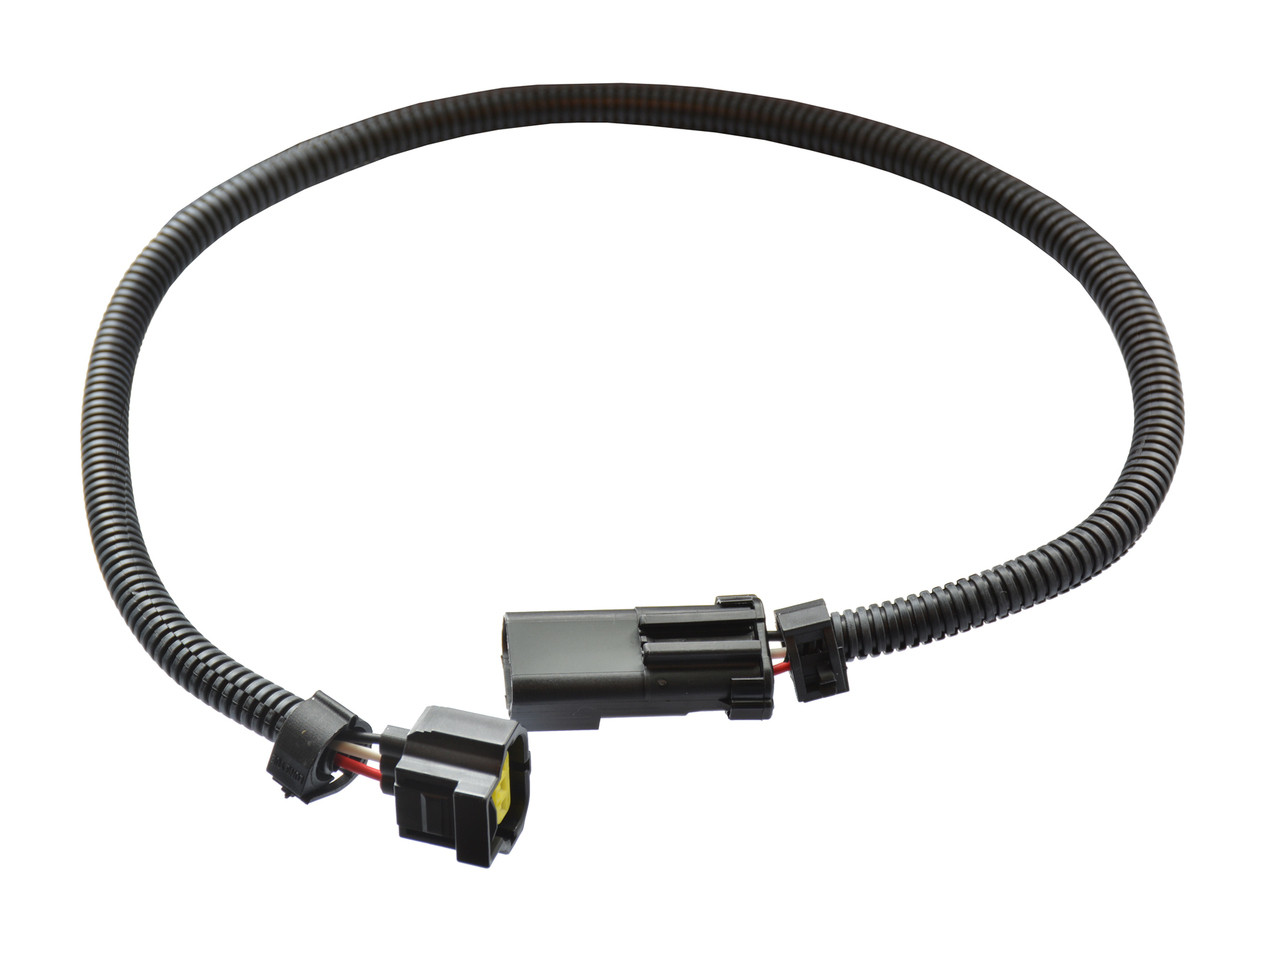 2001 2004 jeep grand cherokee 4 7l engine radiator cooling fan wire harness [ 1280 x 960 Pixel ]